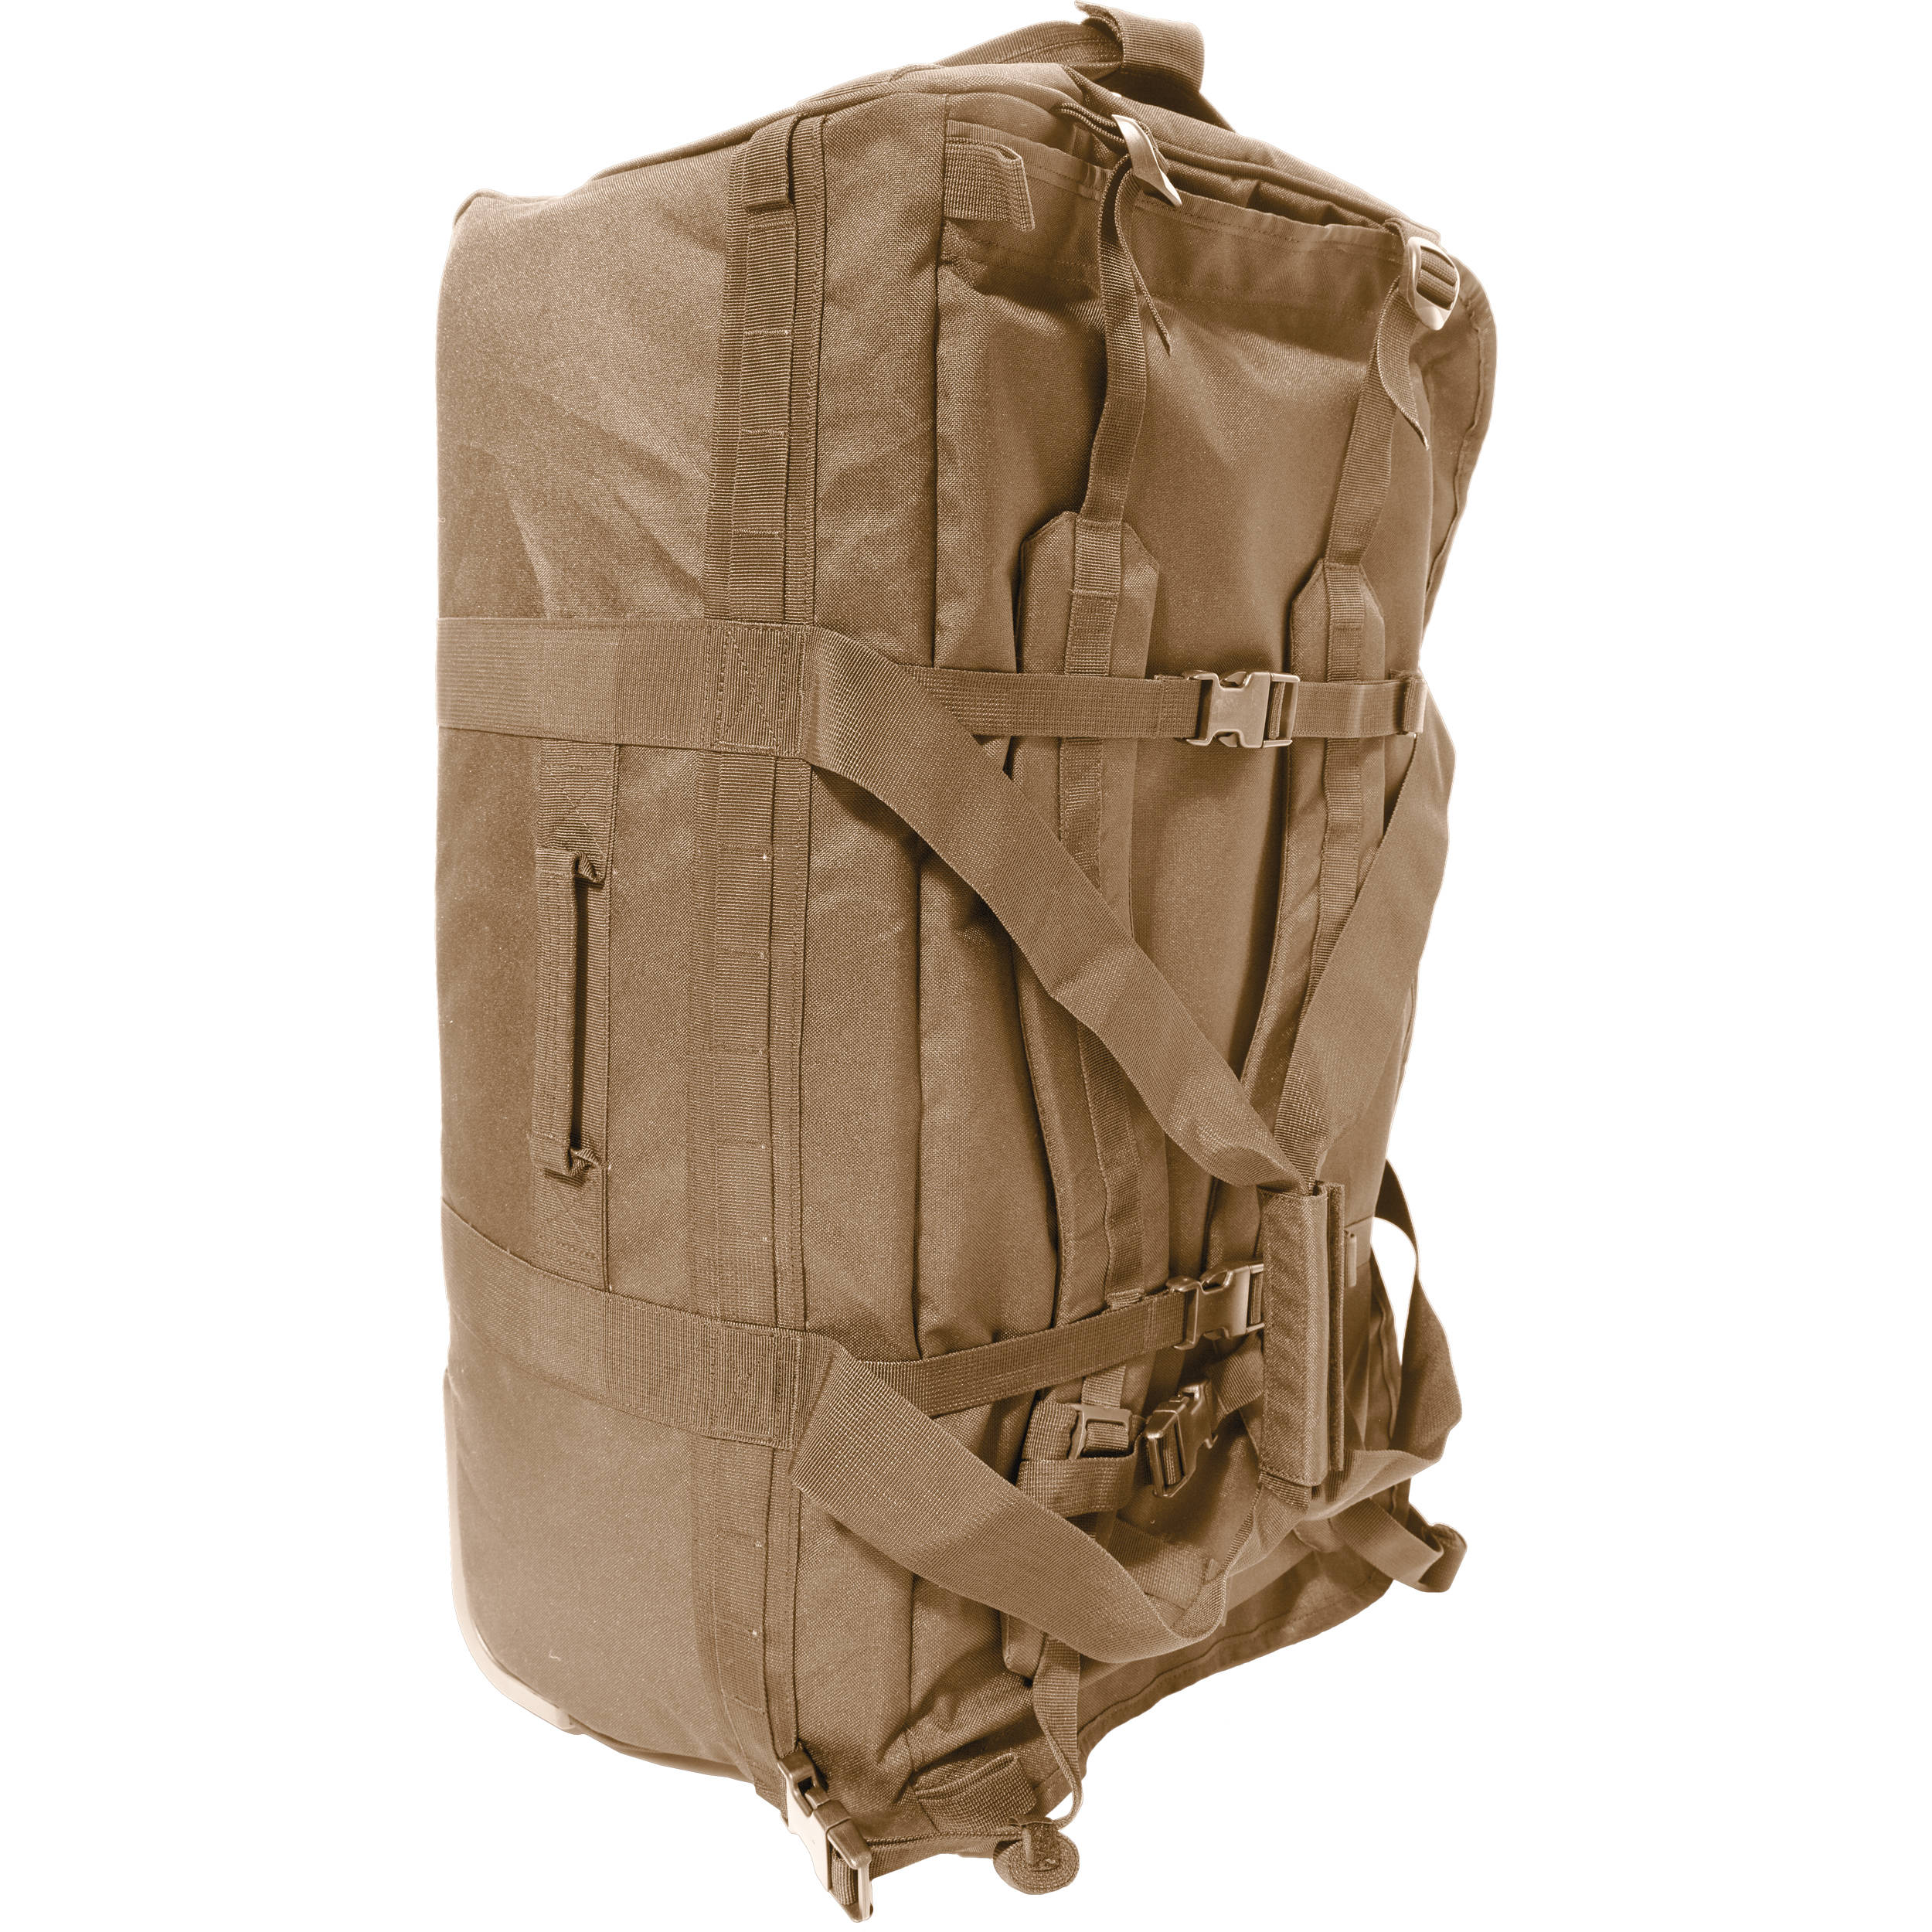 Humvee Roller Deployment Bag Tan